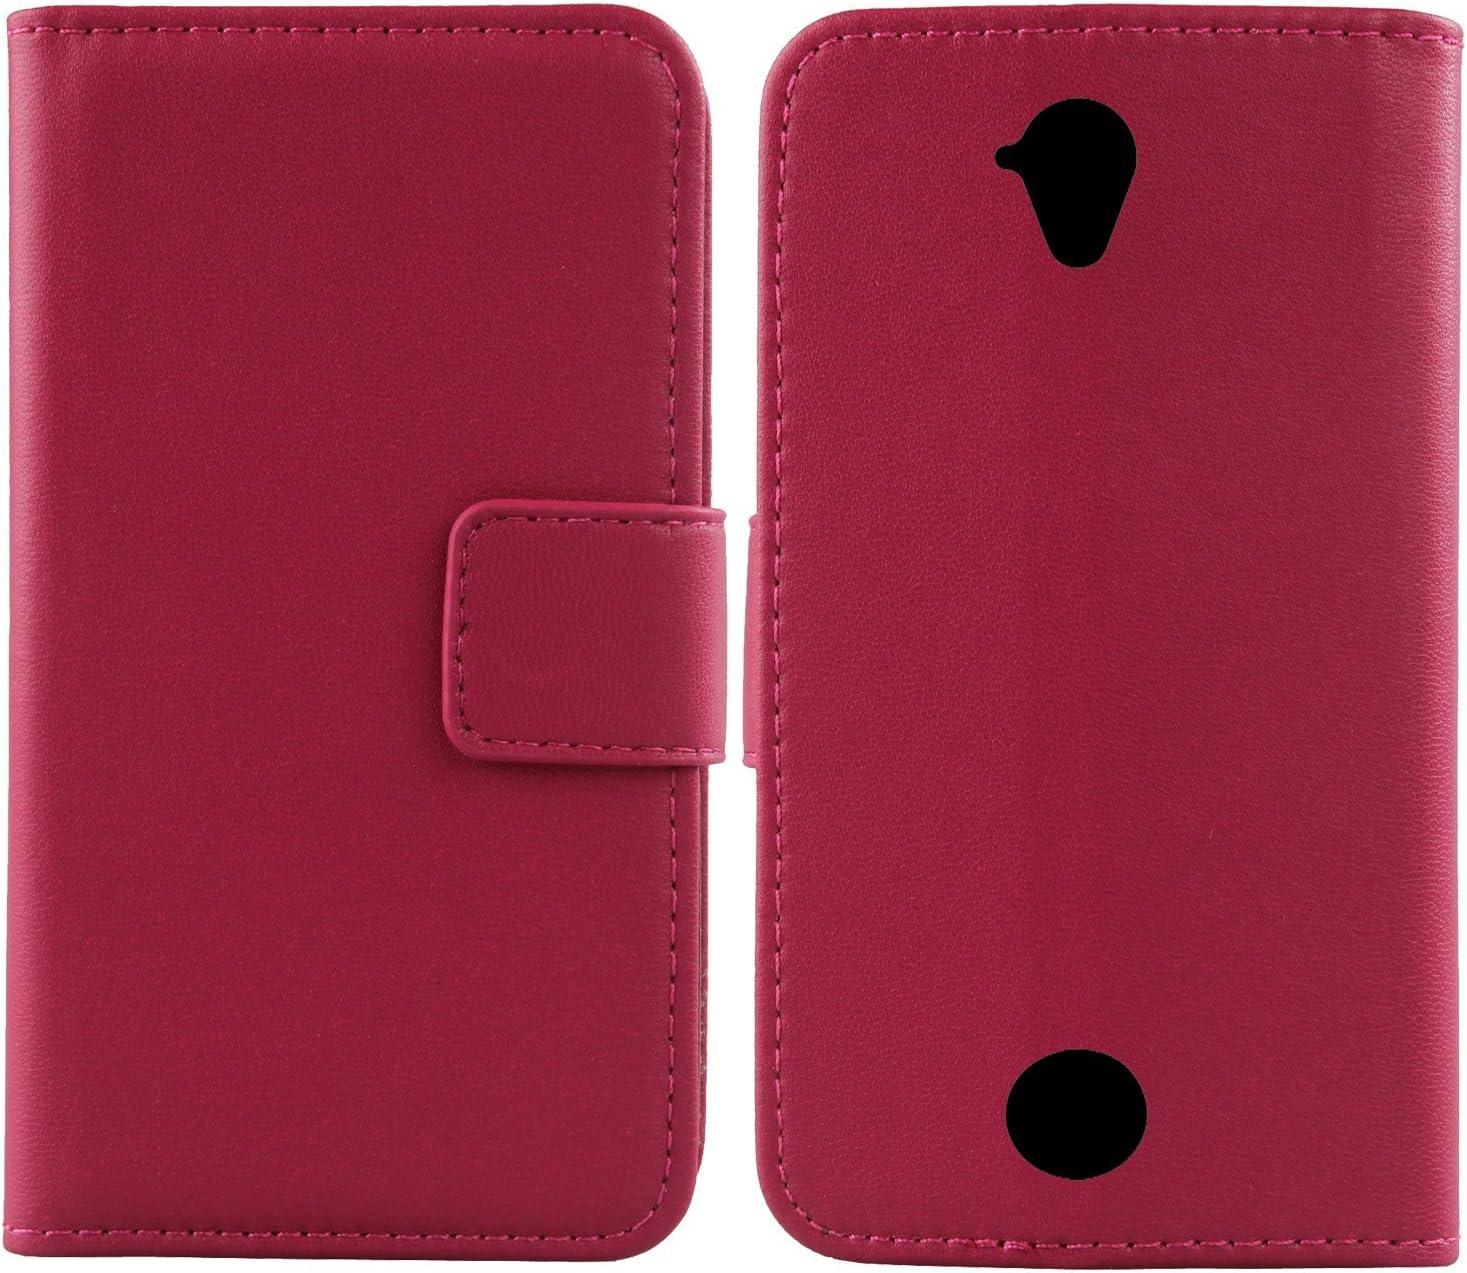 Gukas Design Genuine Leather Case for Acer Liquid Z330 Z320 M330 4.5